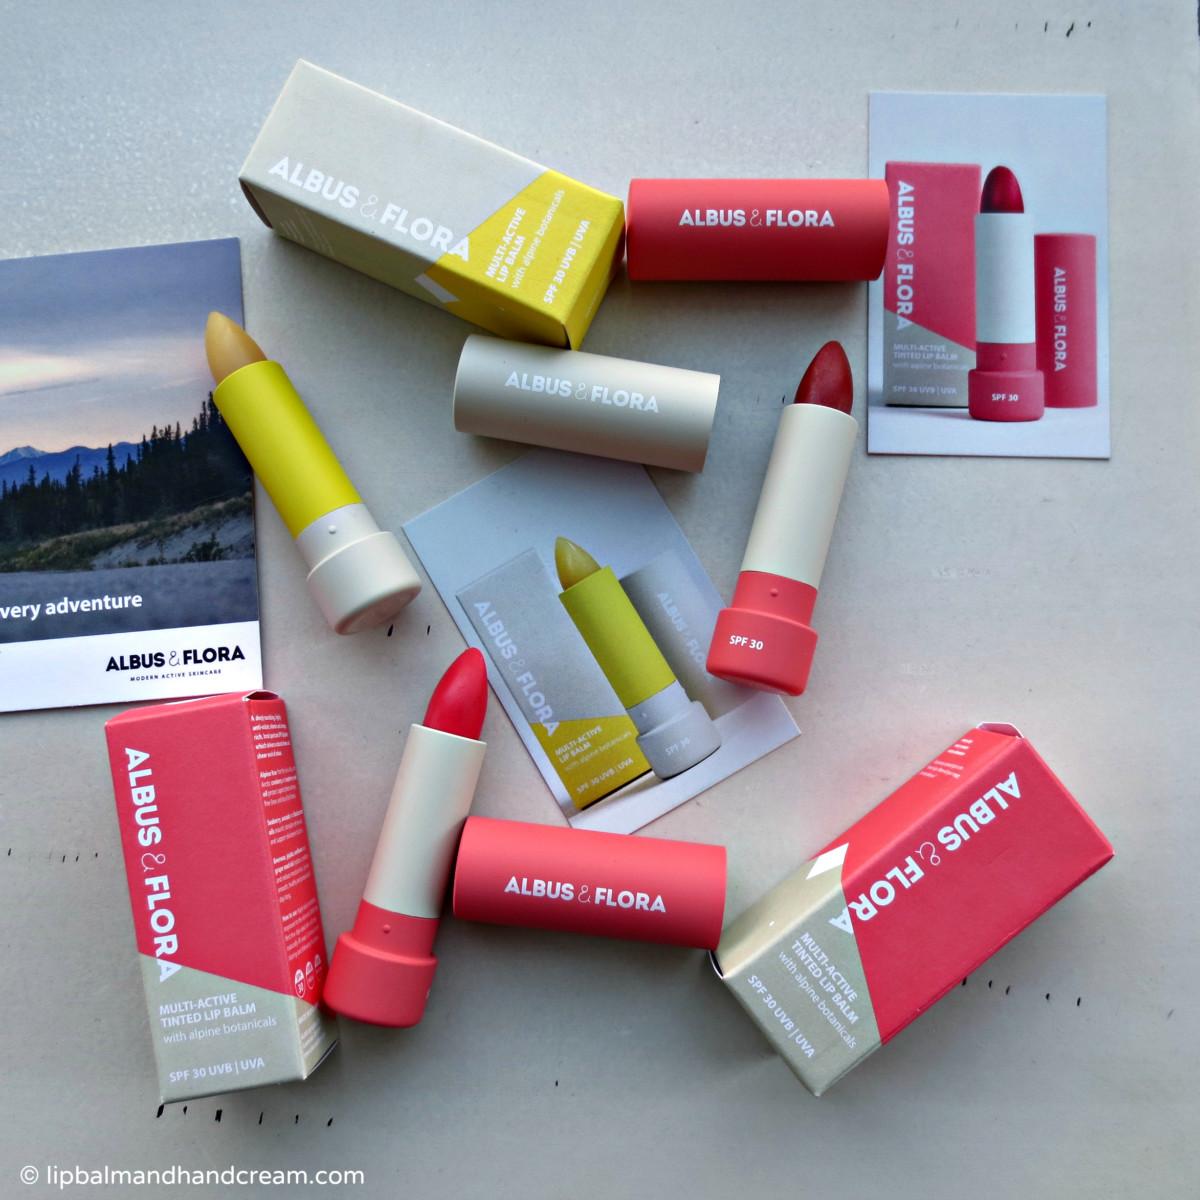 A new discovery in lip balms! Albus & Flora multi-active lip balms